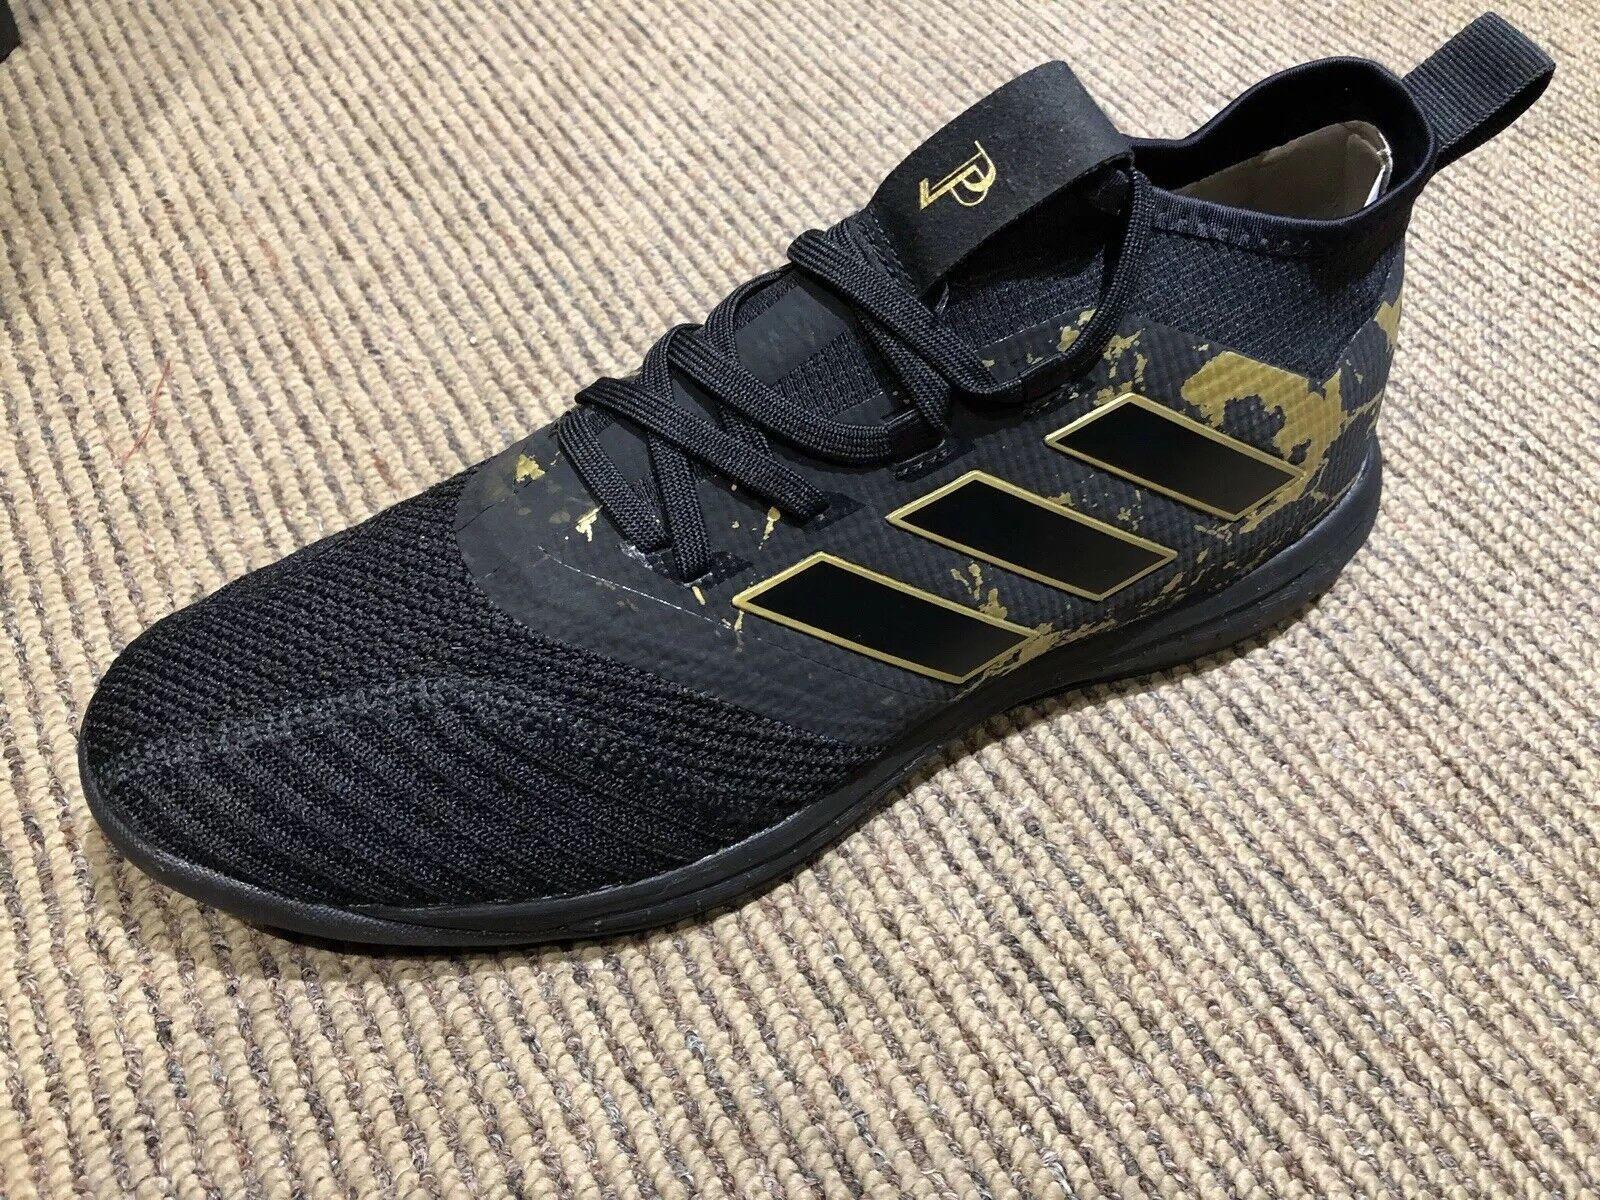 Adidas PP Ace Tango 17.1 TR Paul Pogba Collection Talla 10 US